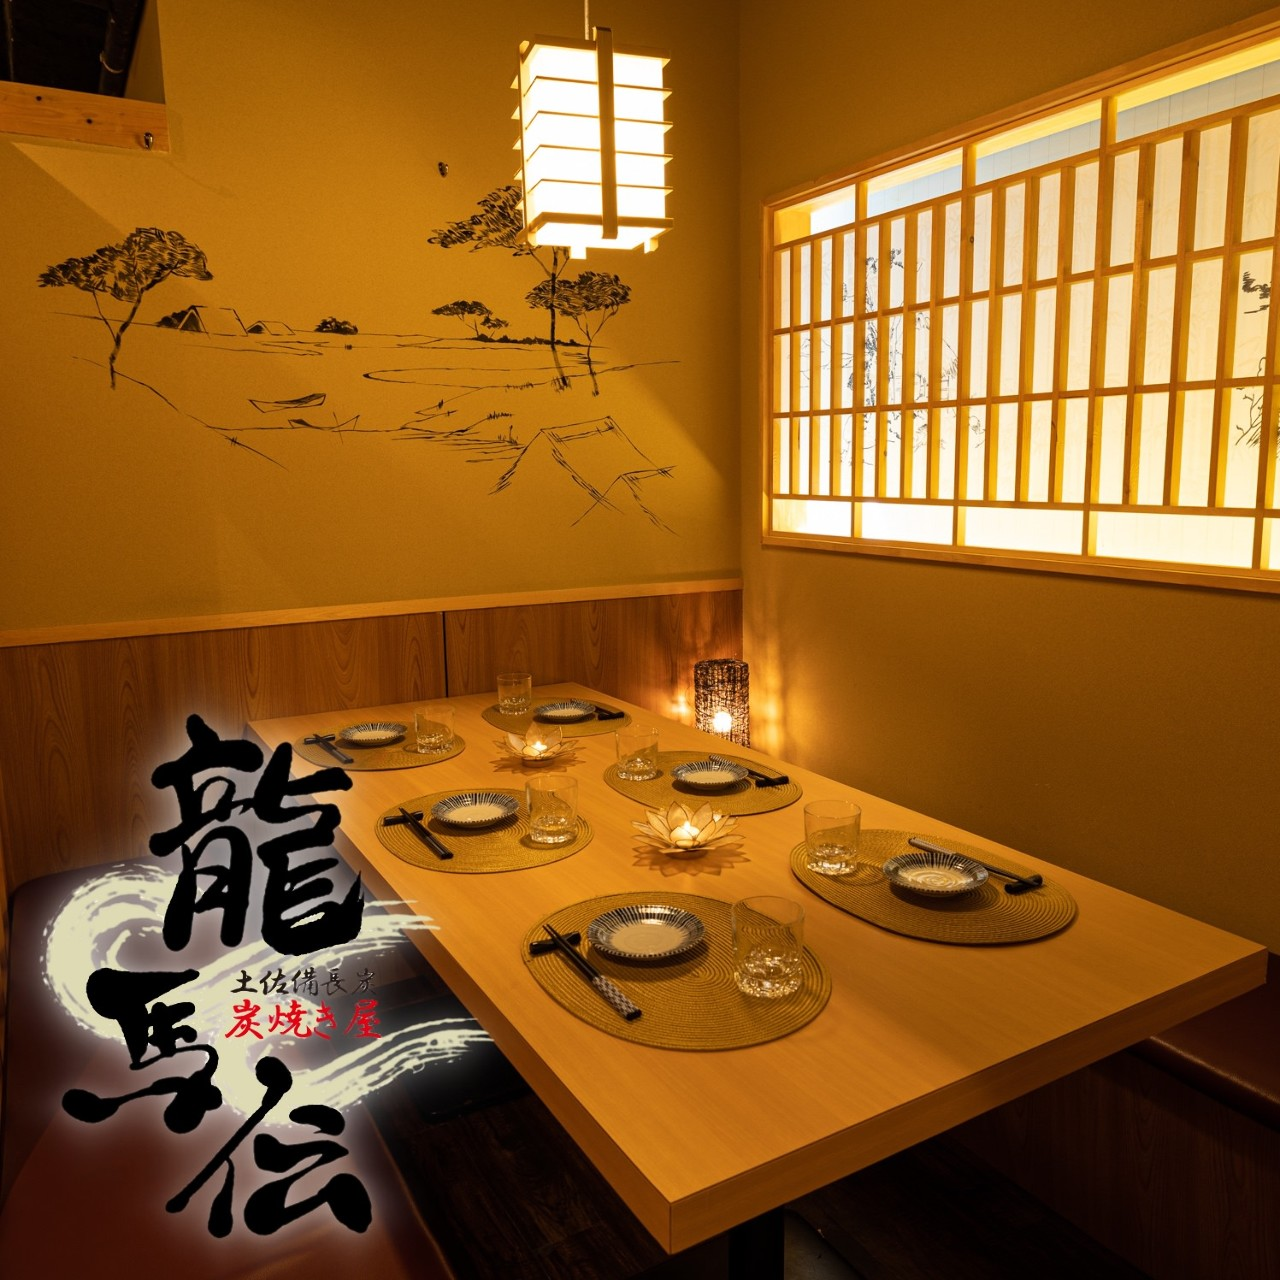 全席個室と日本酒 炭焼き屋 龍馬伝 品川駅前店